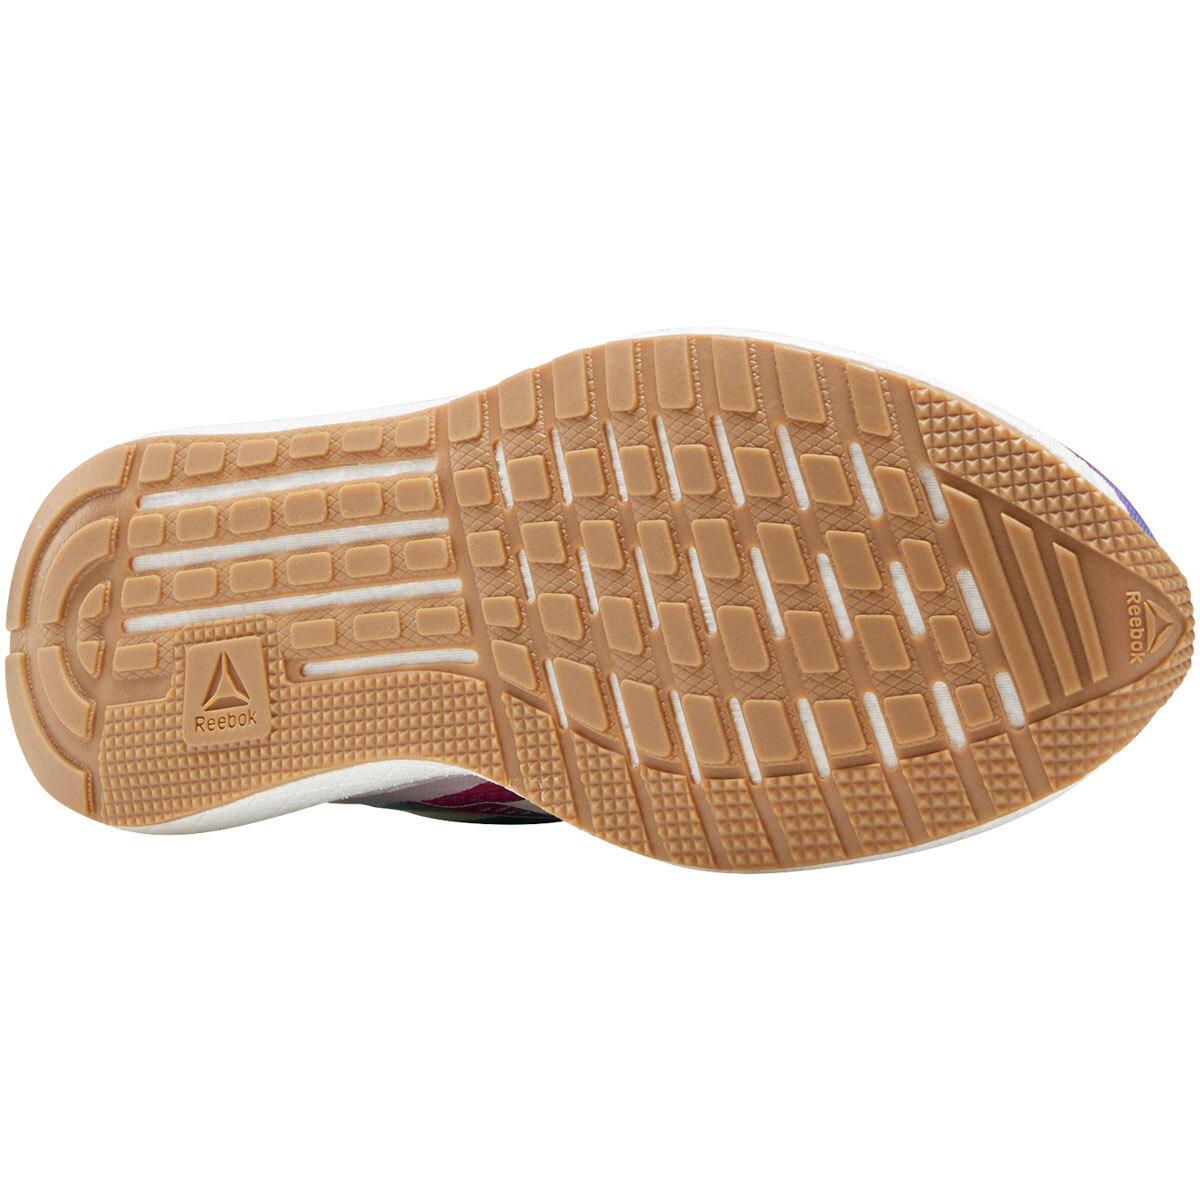 Women's Reebok Forever Floatride Energy 2.0 Running Shoe - Color: Pride - Size: 5 - Width: Regular, Pride, large, image 2